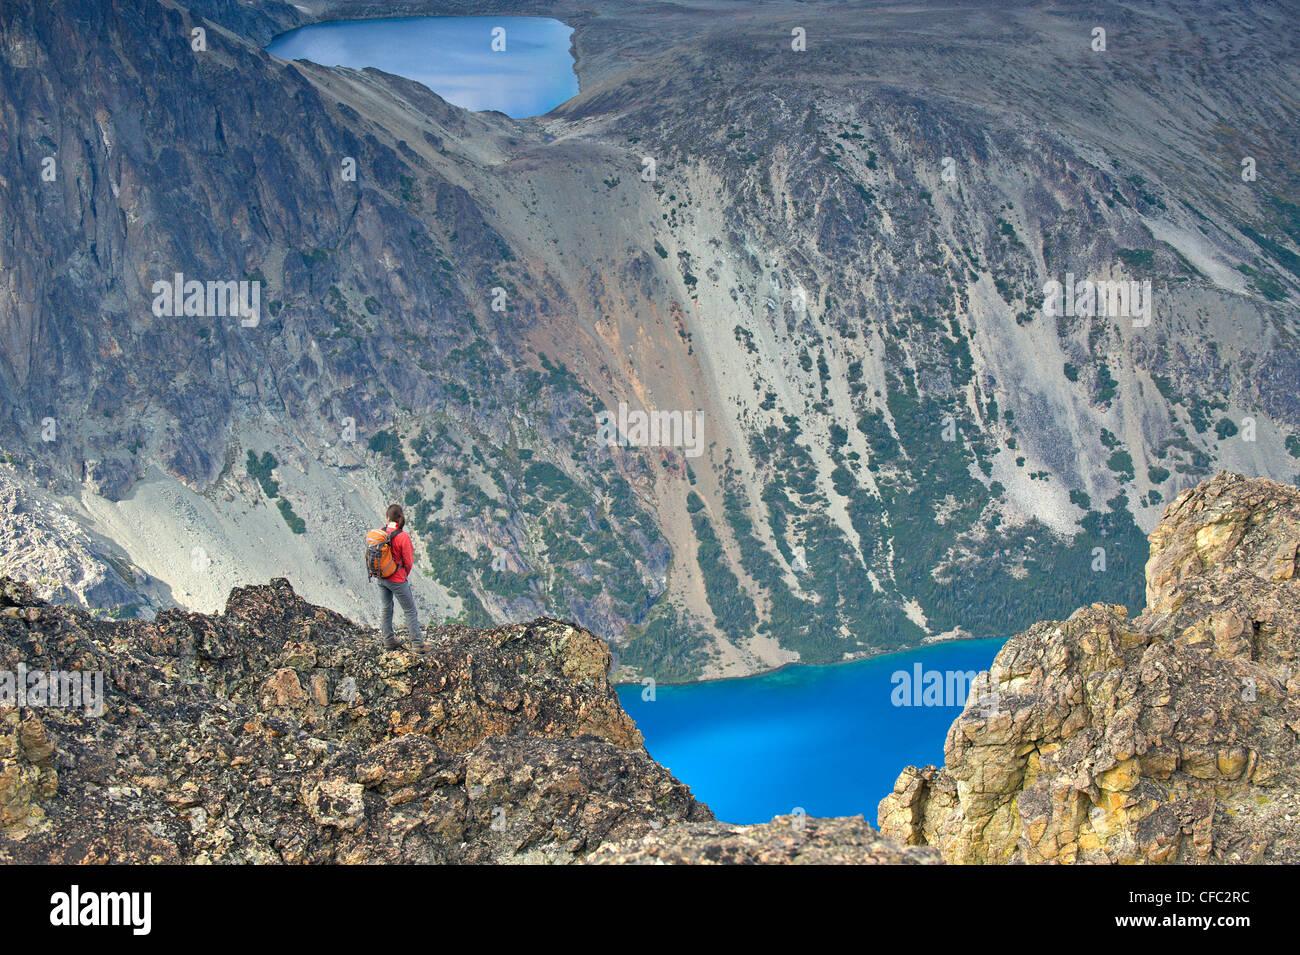 A woman surveys incredible alpine lakes in the Niut Range of British Columbia's Coast Mountains - Stock Image